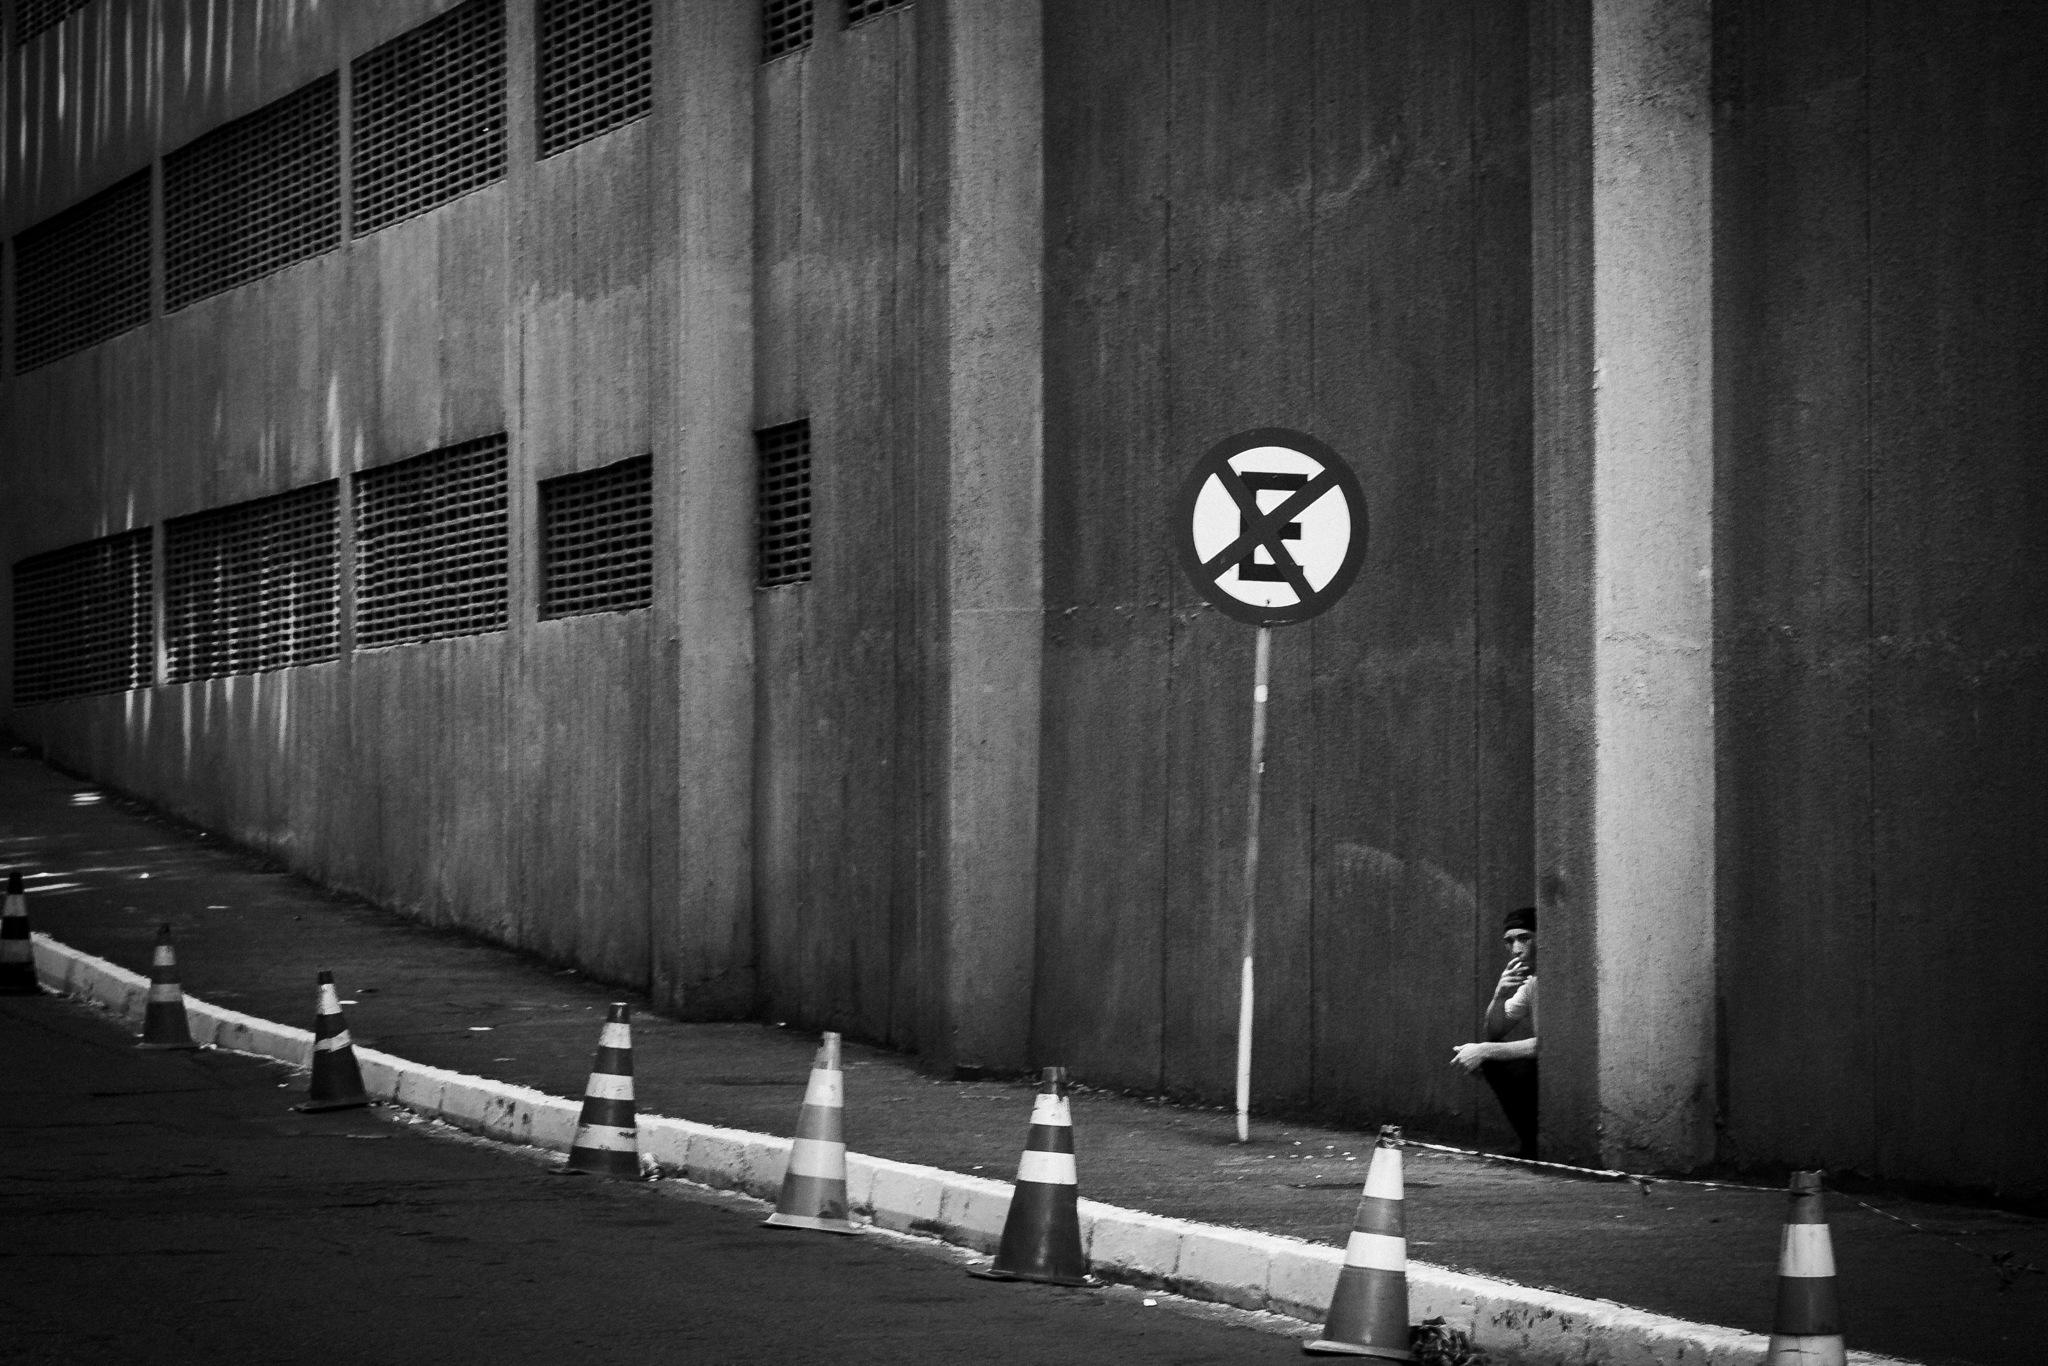 Brasilia 345 by Francisco Willian Saldanha